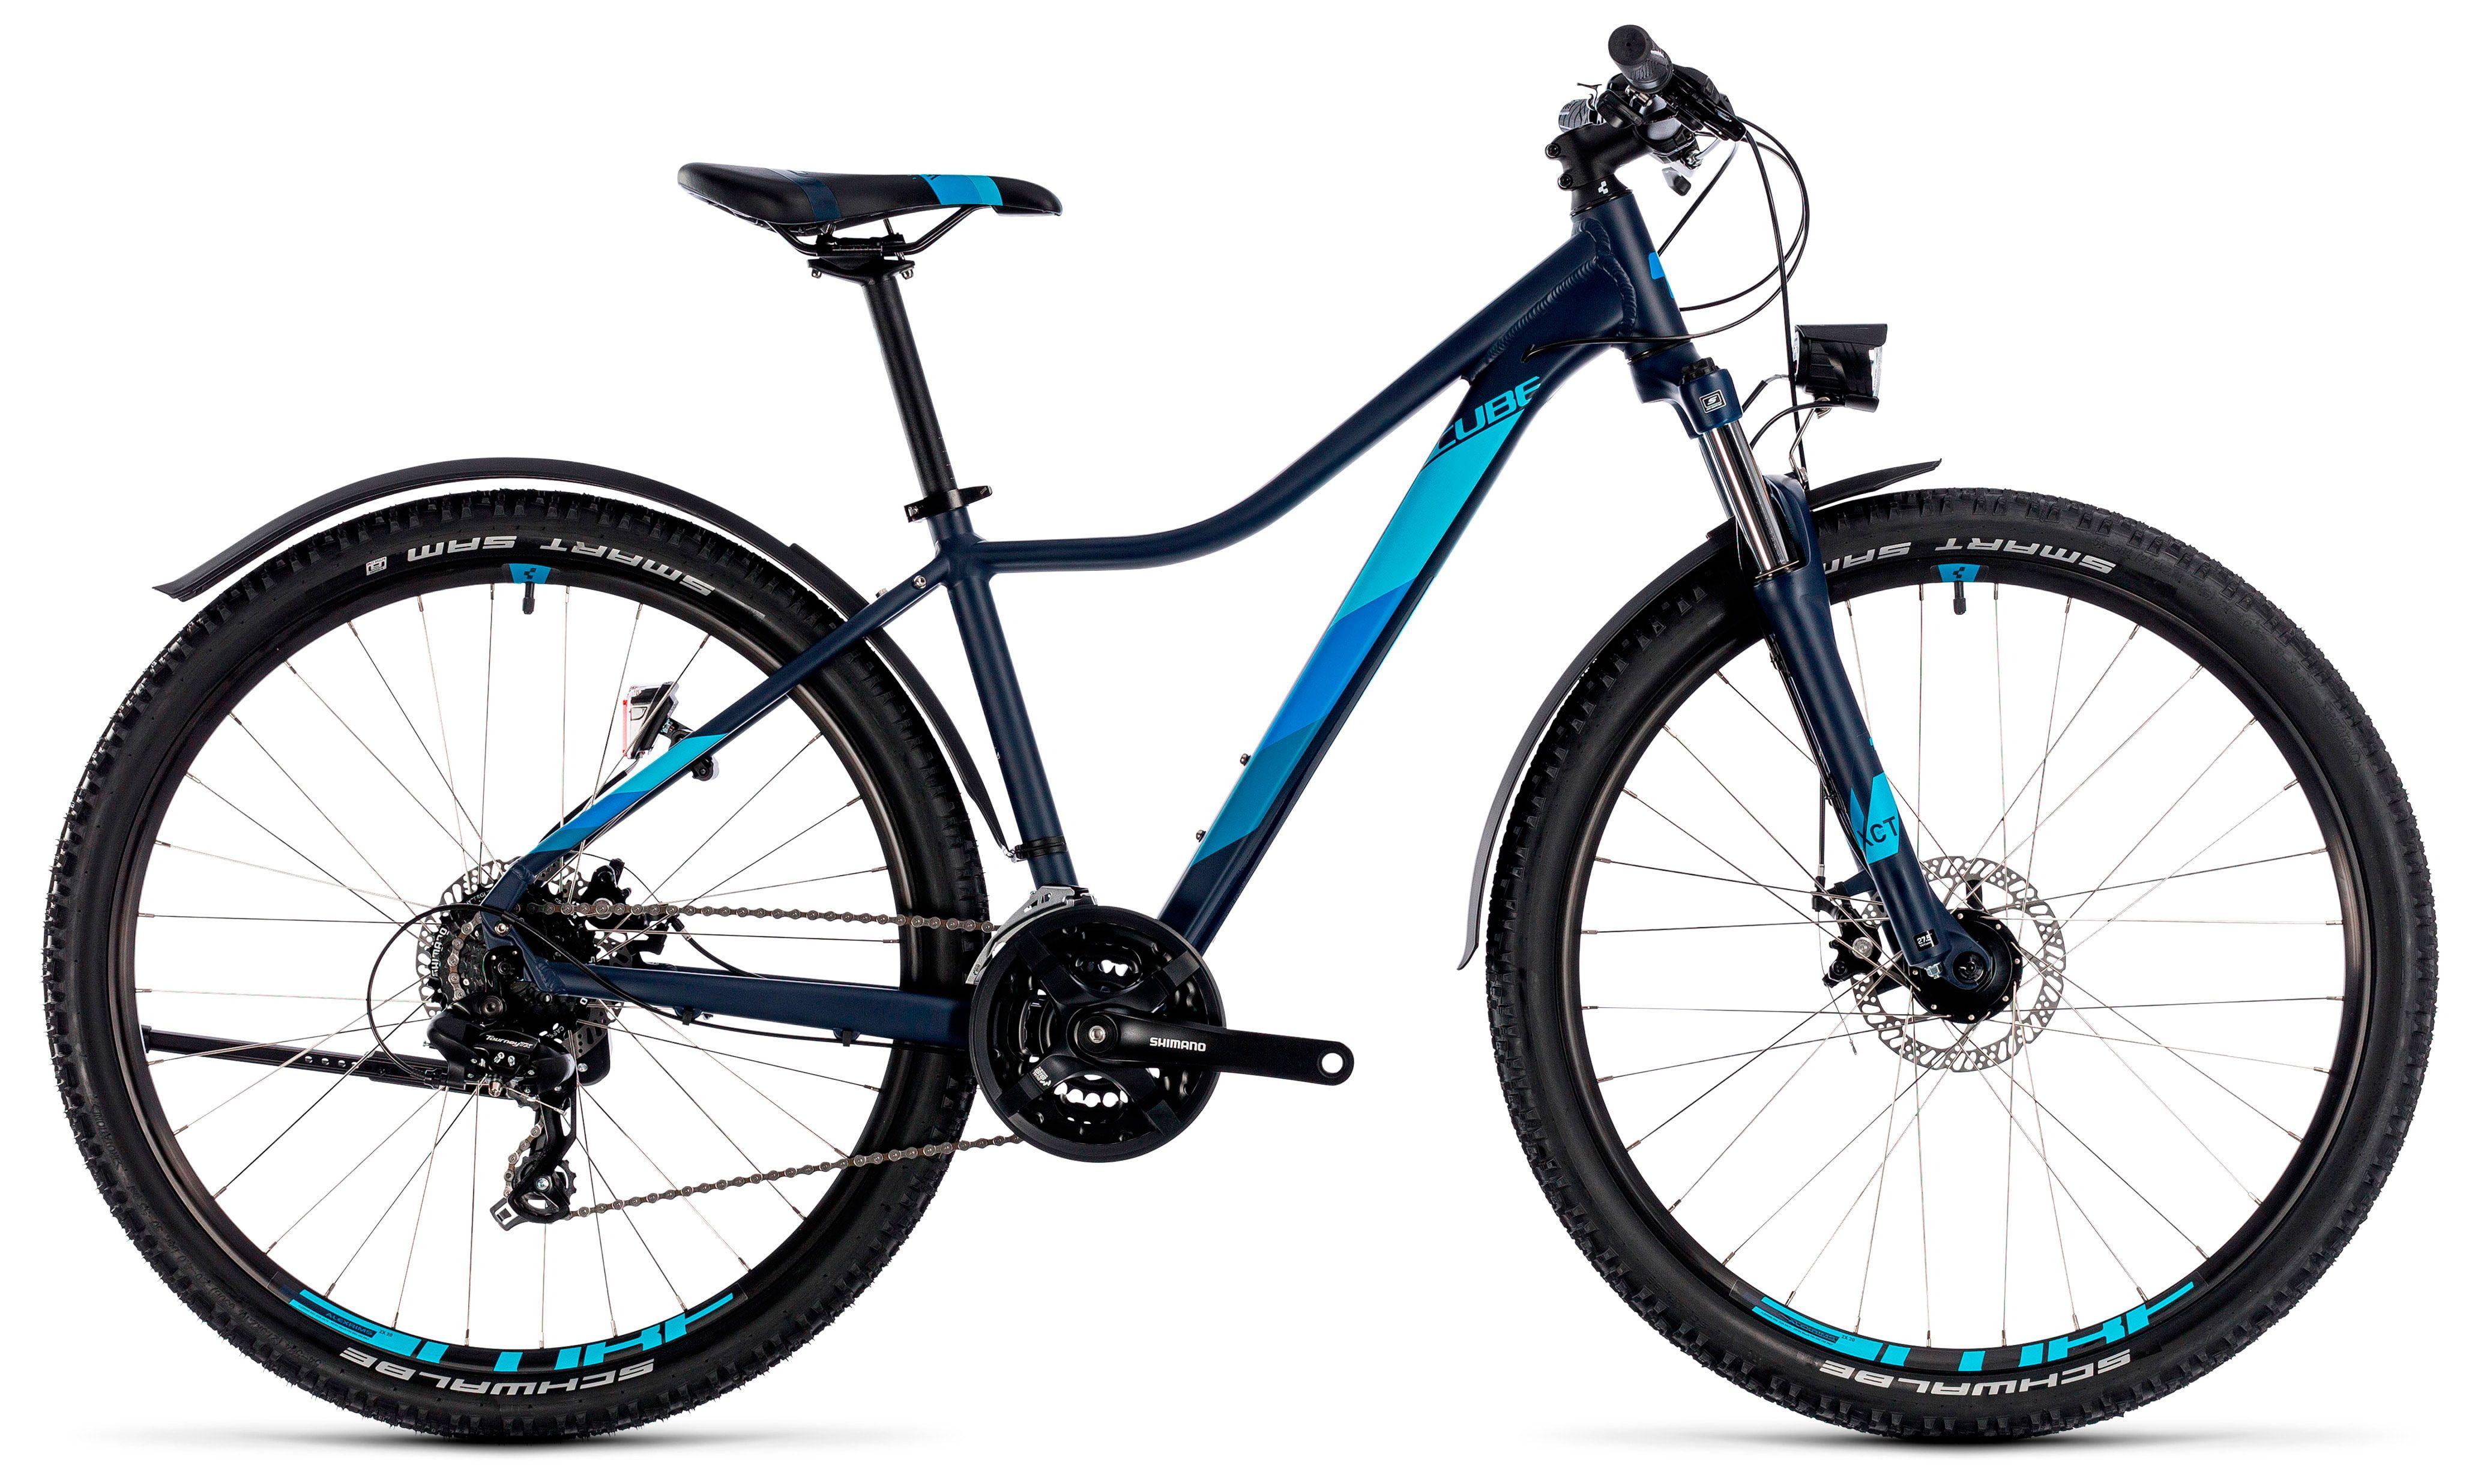 цена на Велосипед Cube Access WS Allroad 29 2018